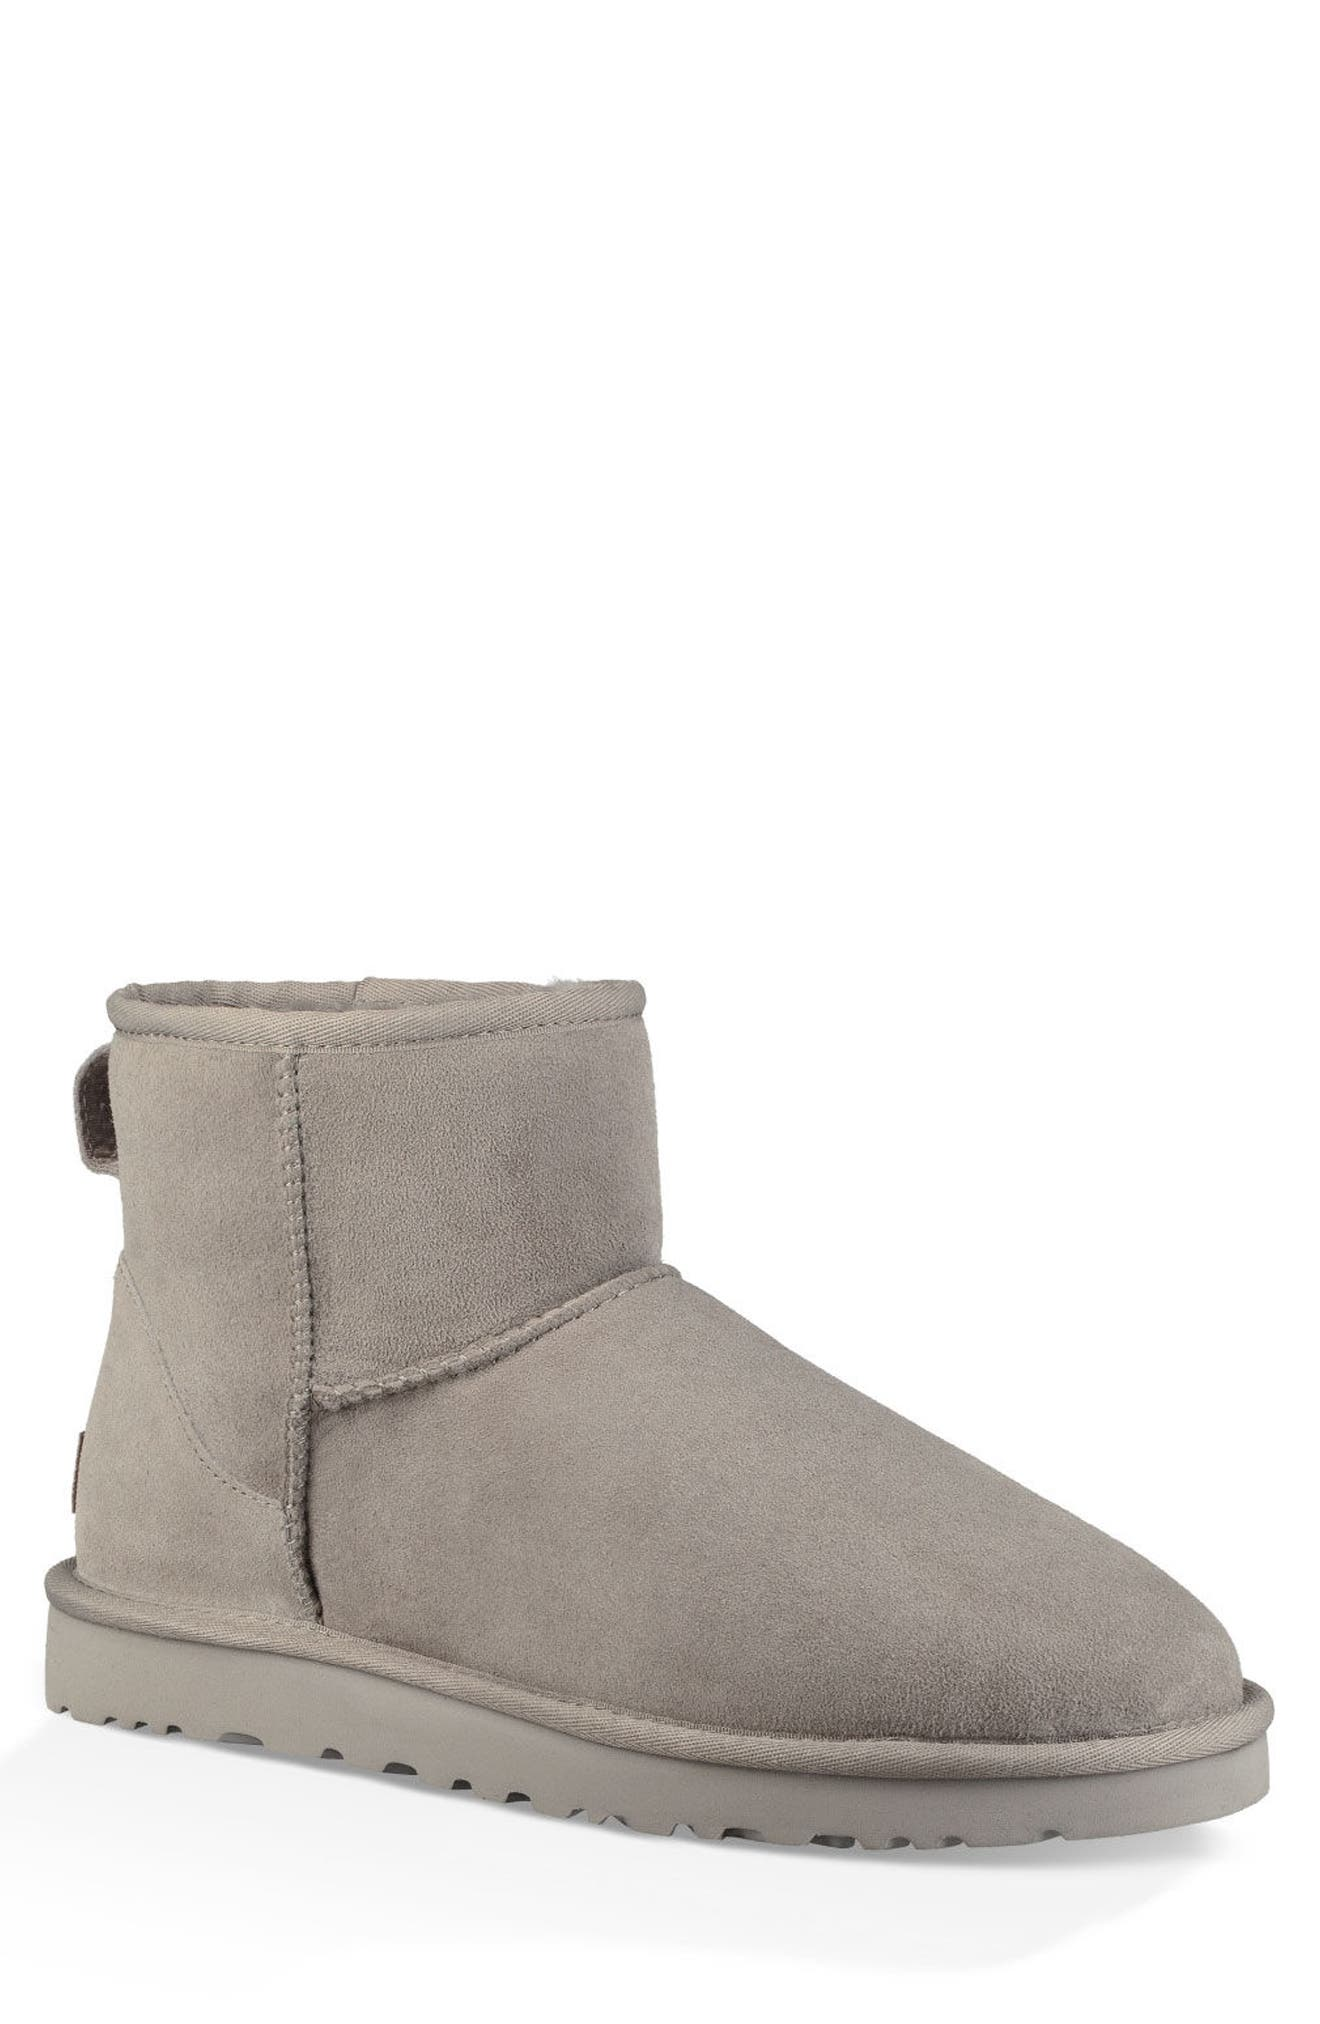 UGG<SUP>®</SUP> Classic Mini Boot, Main, color, 024